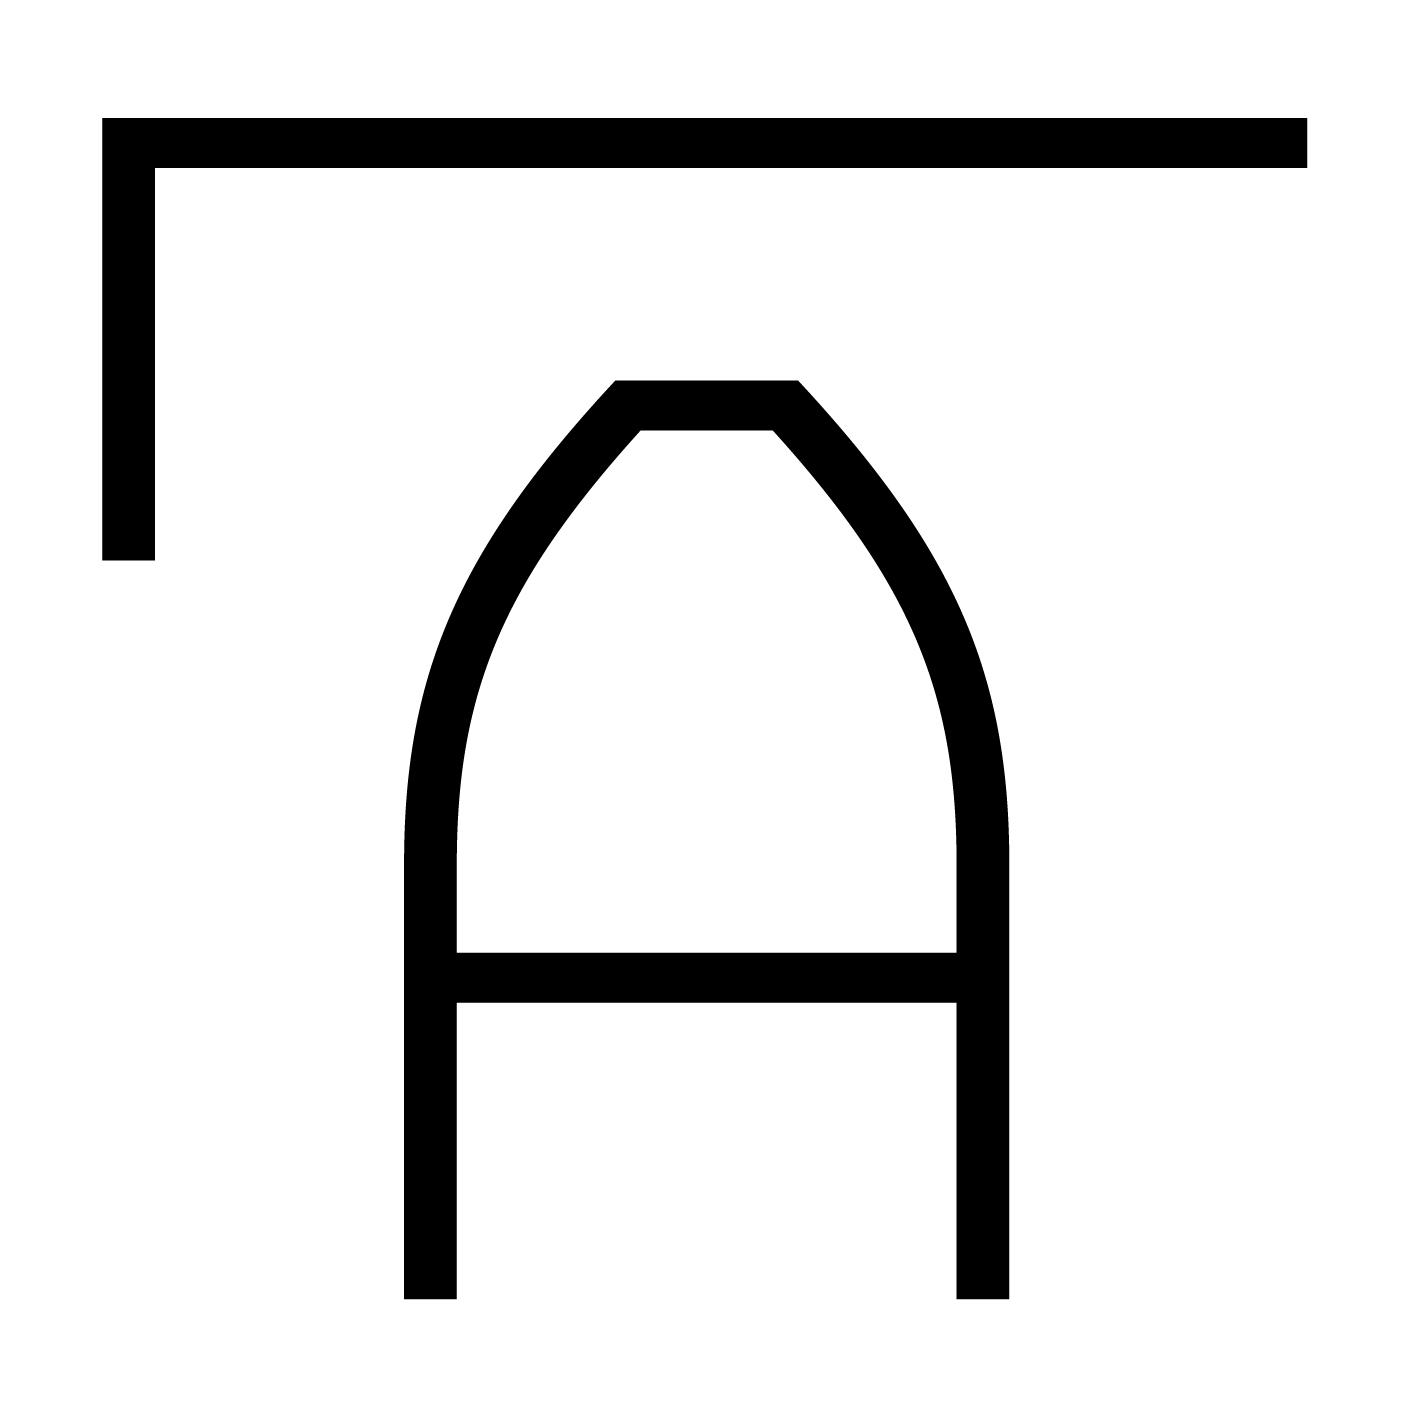 Logo Artothèque, Espaces d'art contemporain de Caen